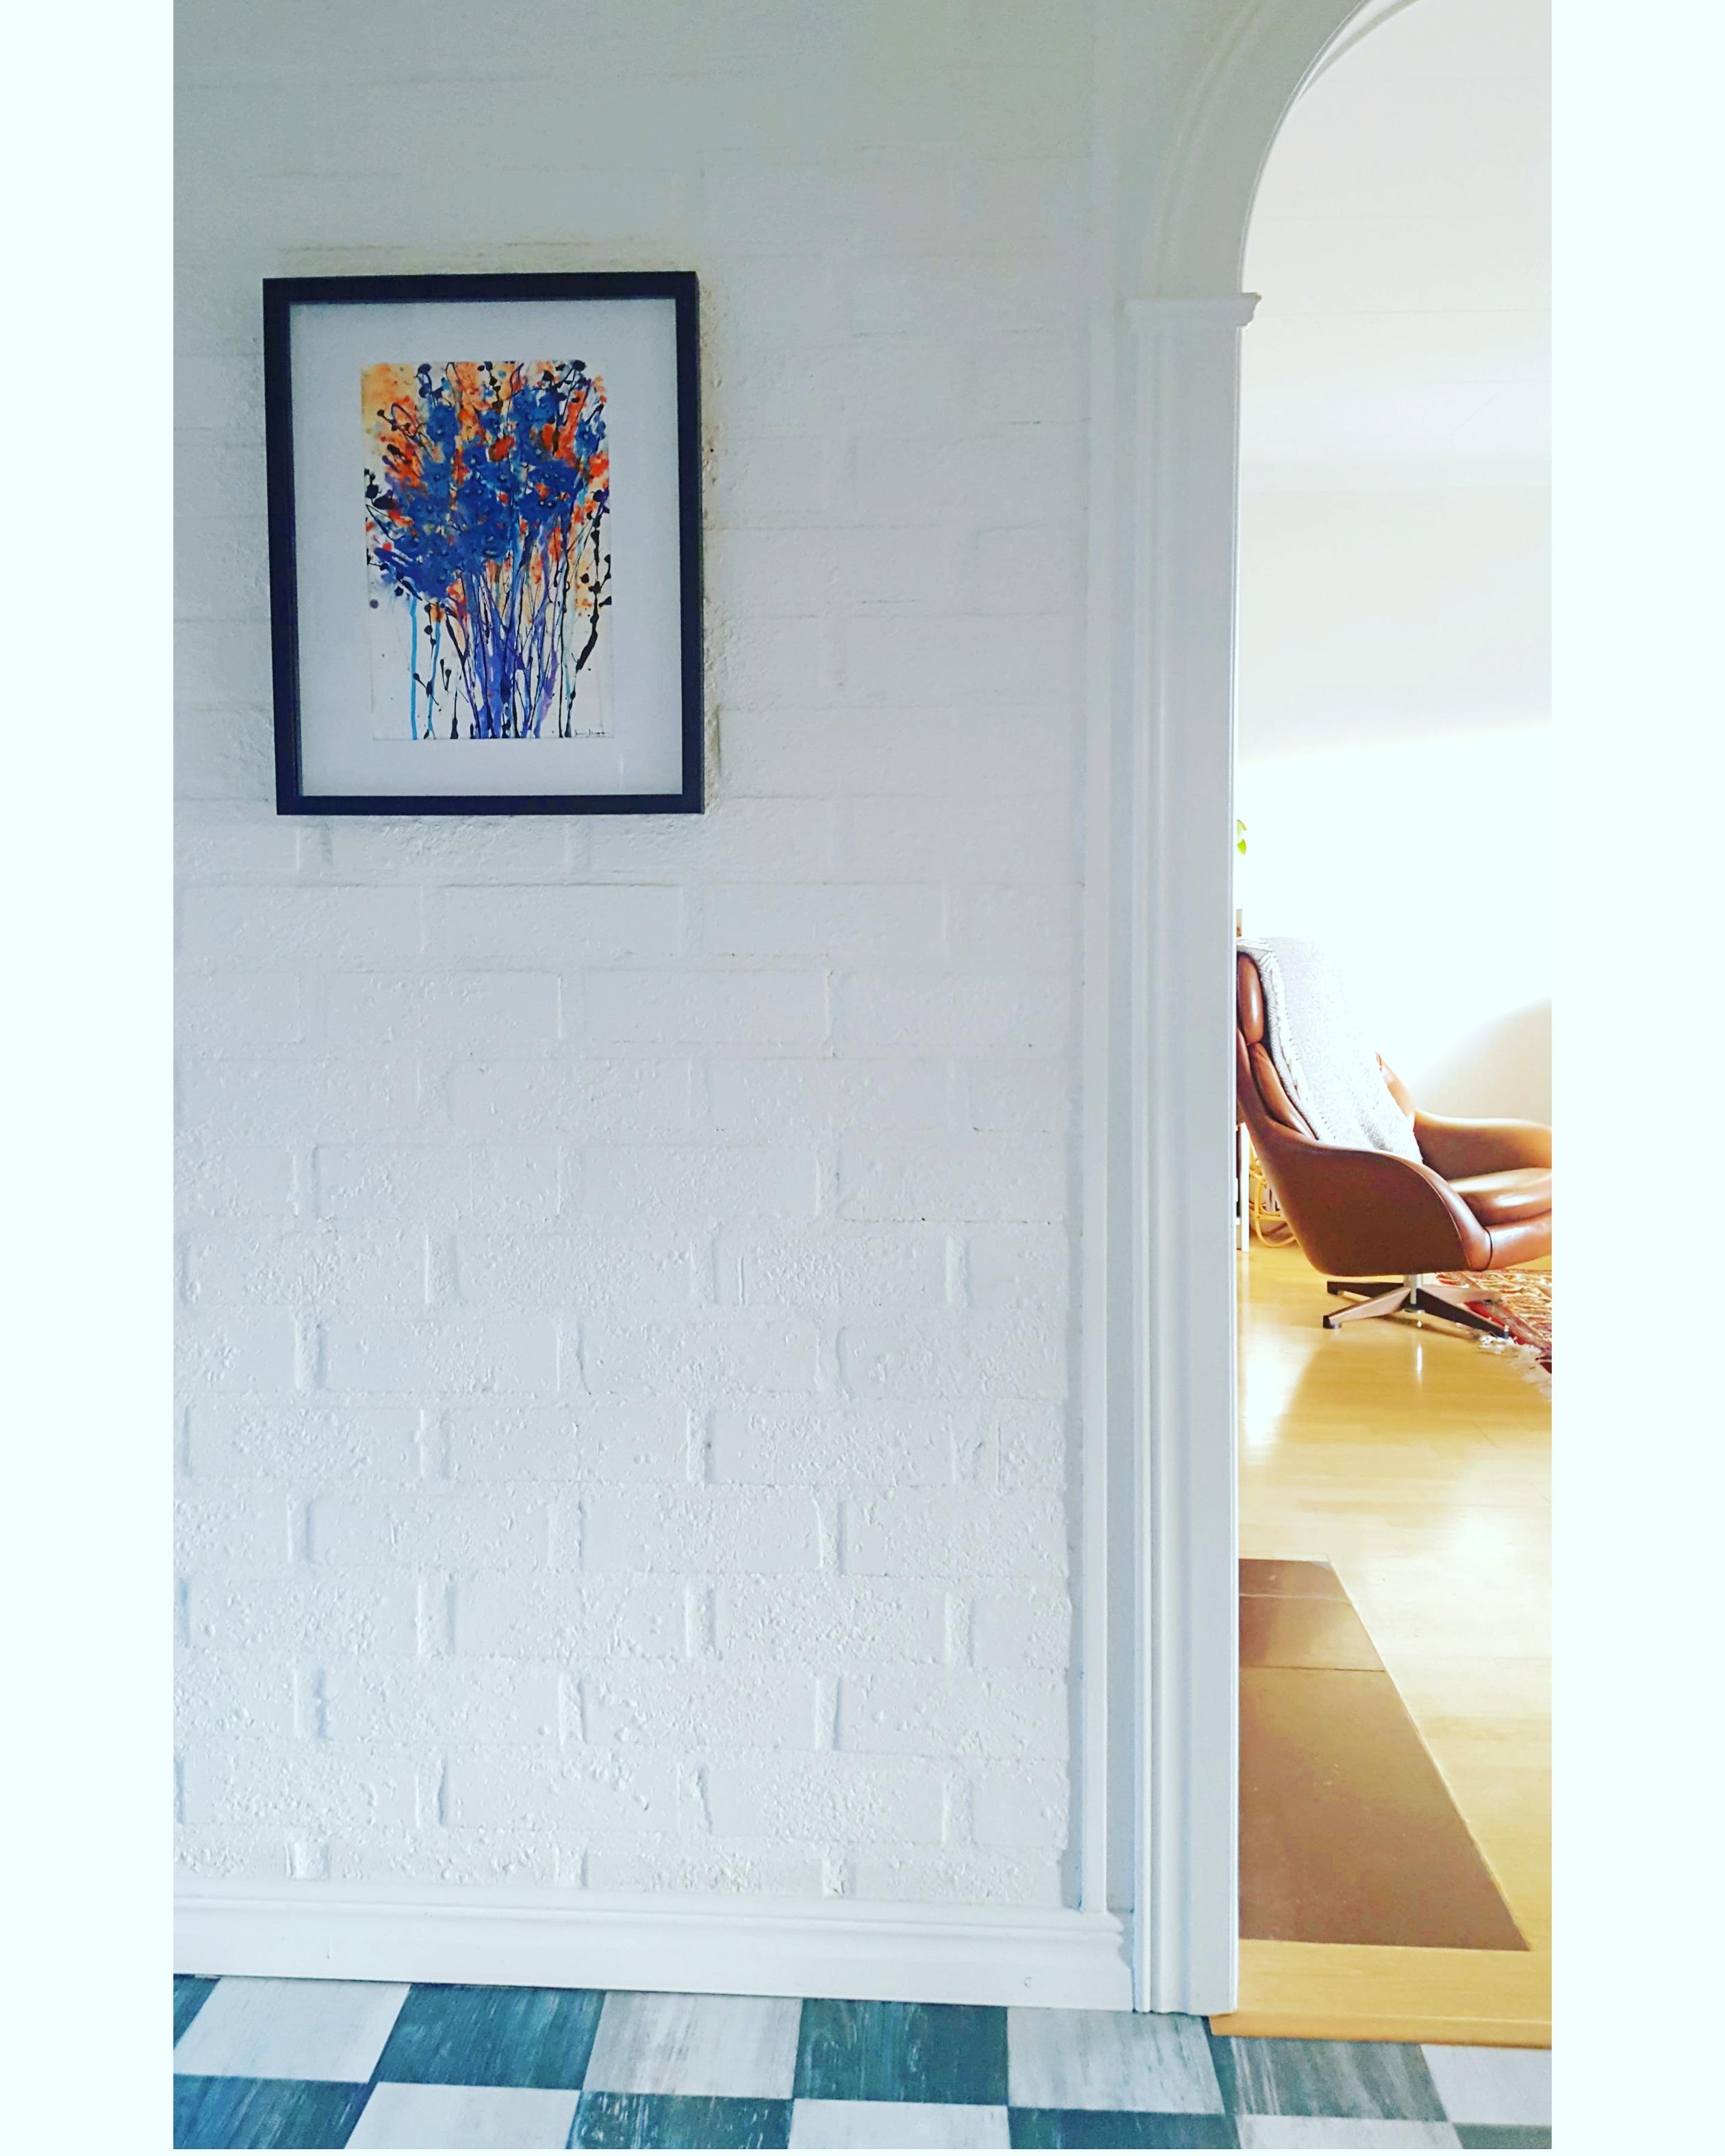 Hanna & Haidars' Hallway